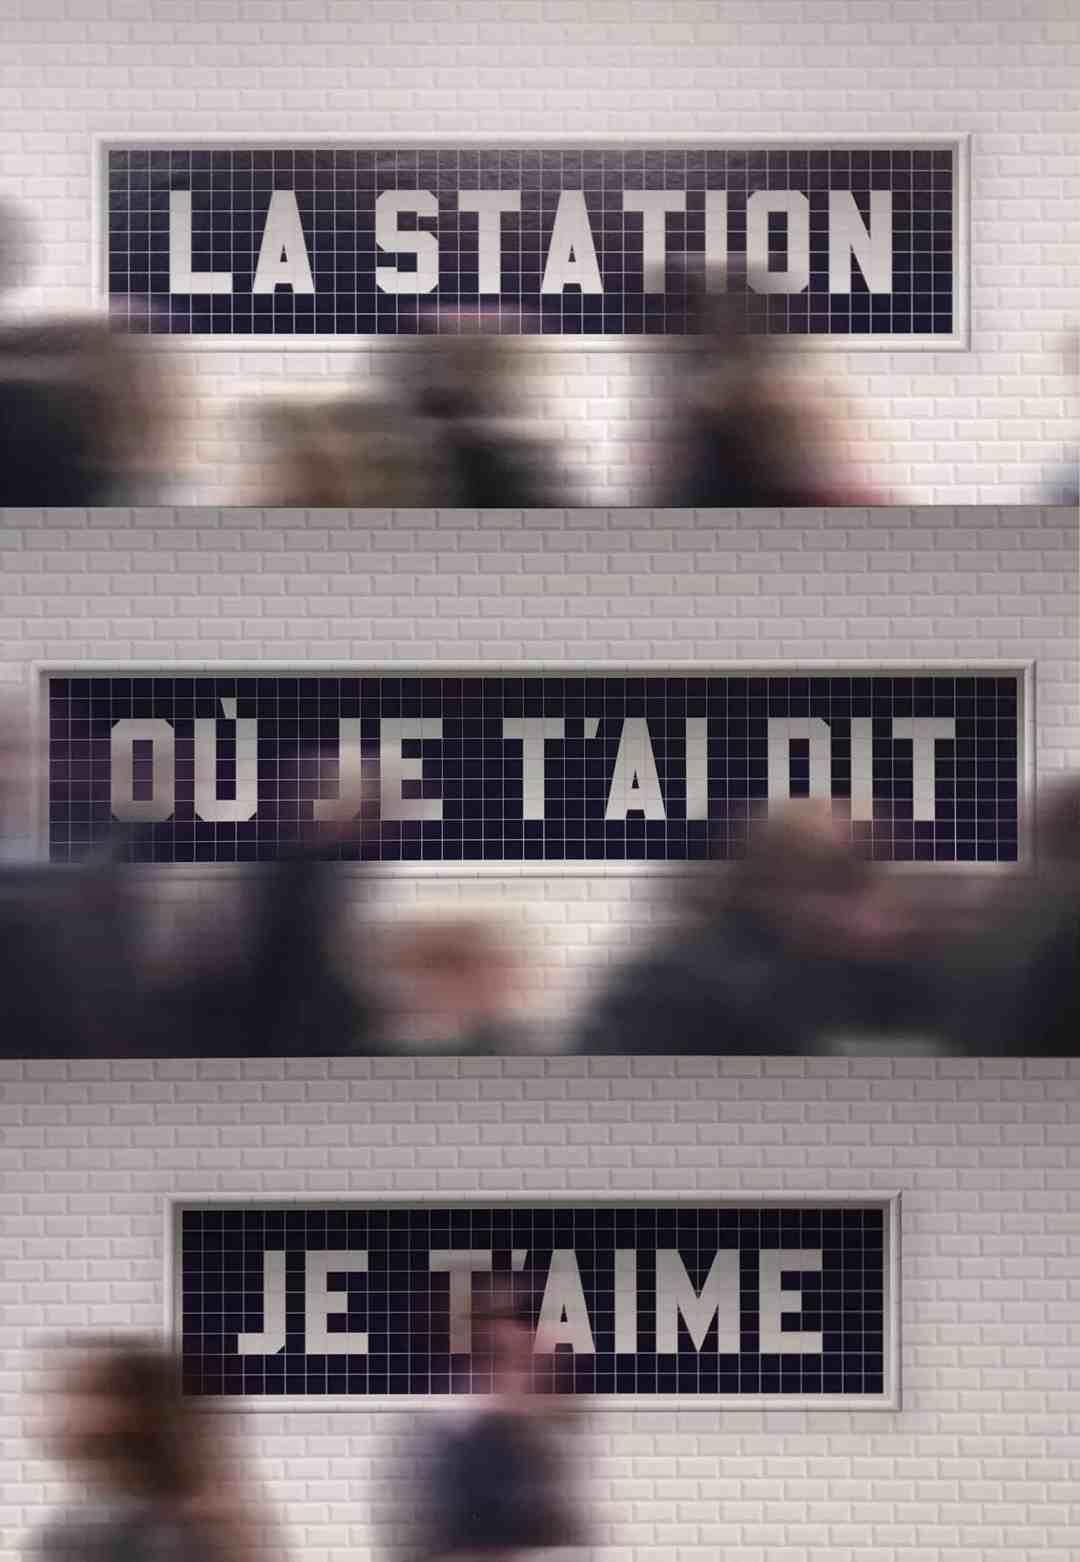 poster courtesy: Alain Le Quernec